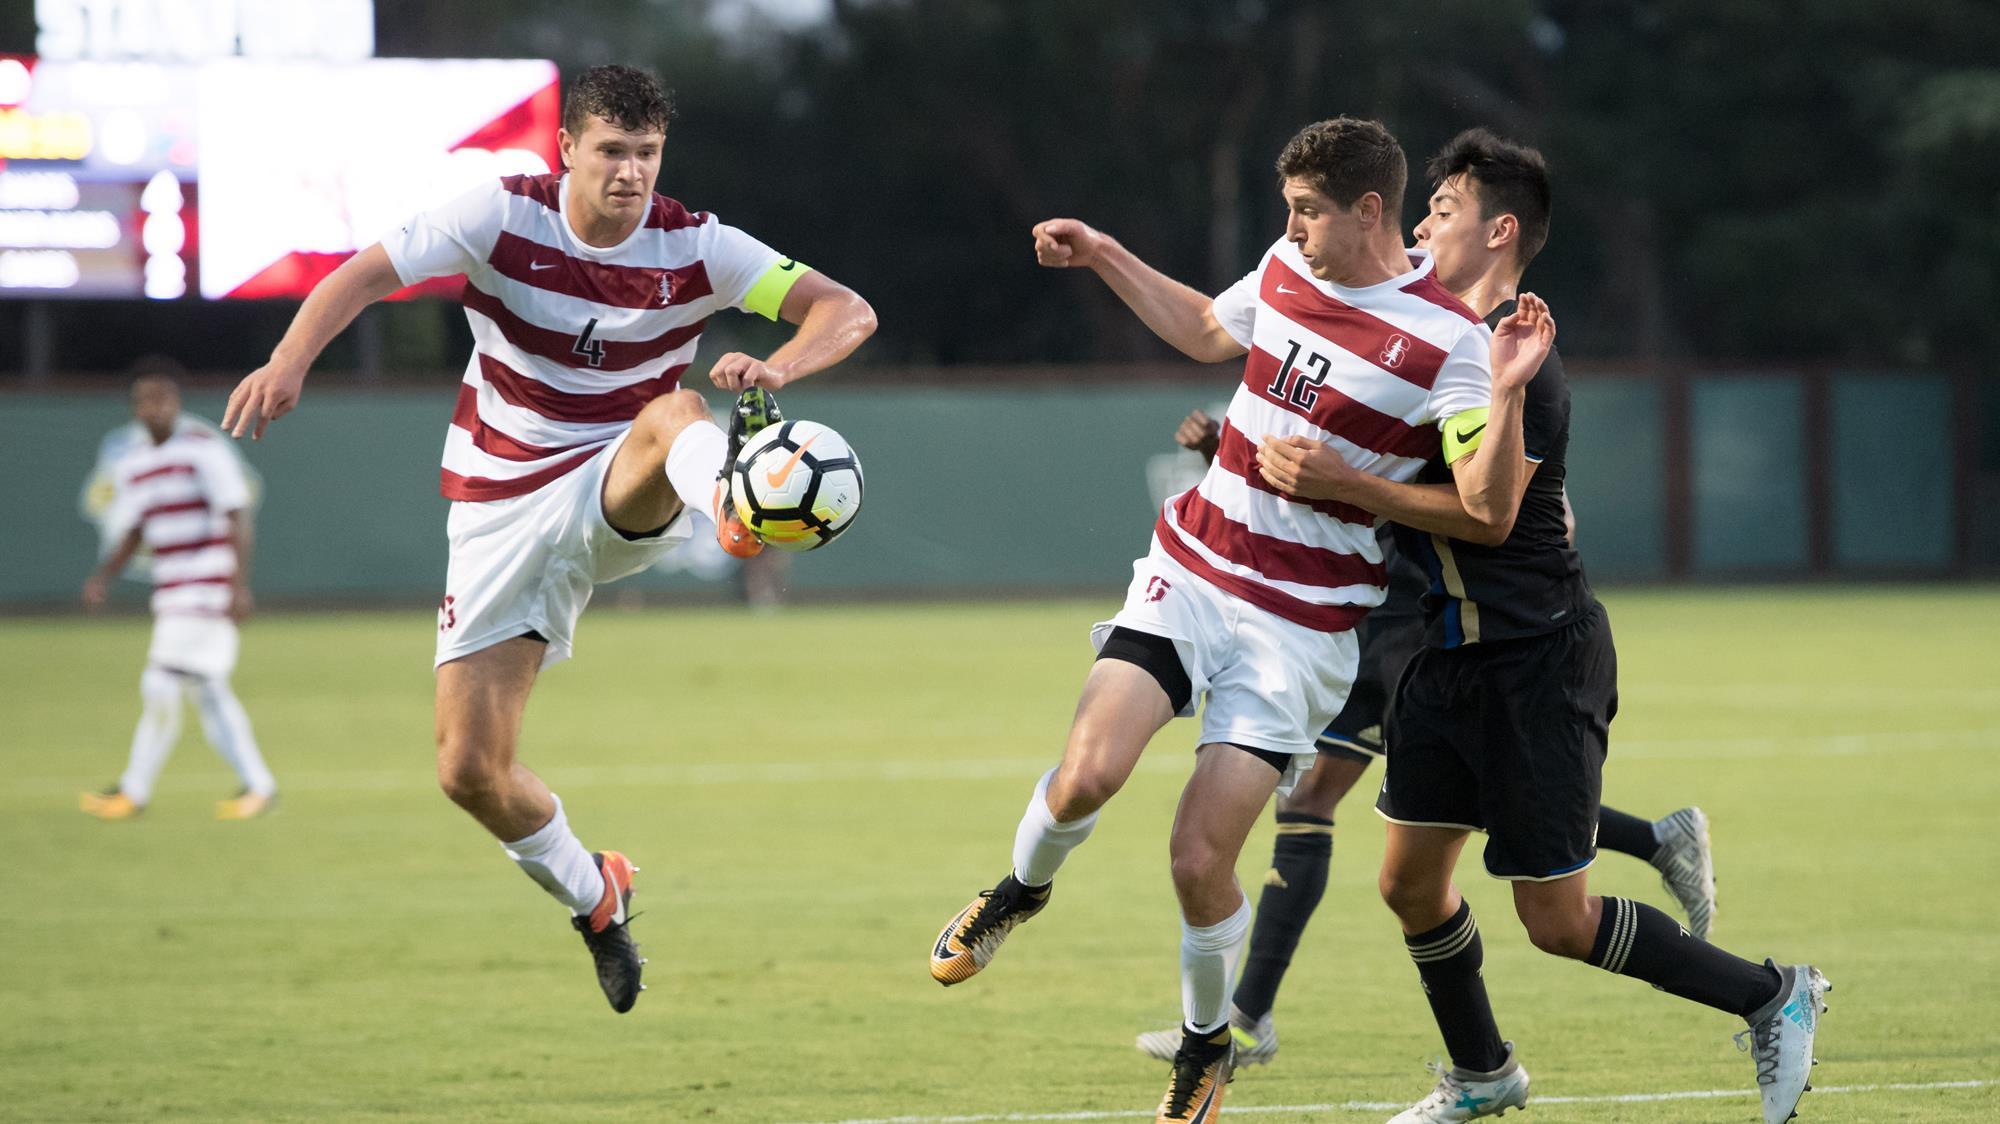 7c4e91c9631 Yale vs Stanford Cardinal Men s Soccer - September 17